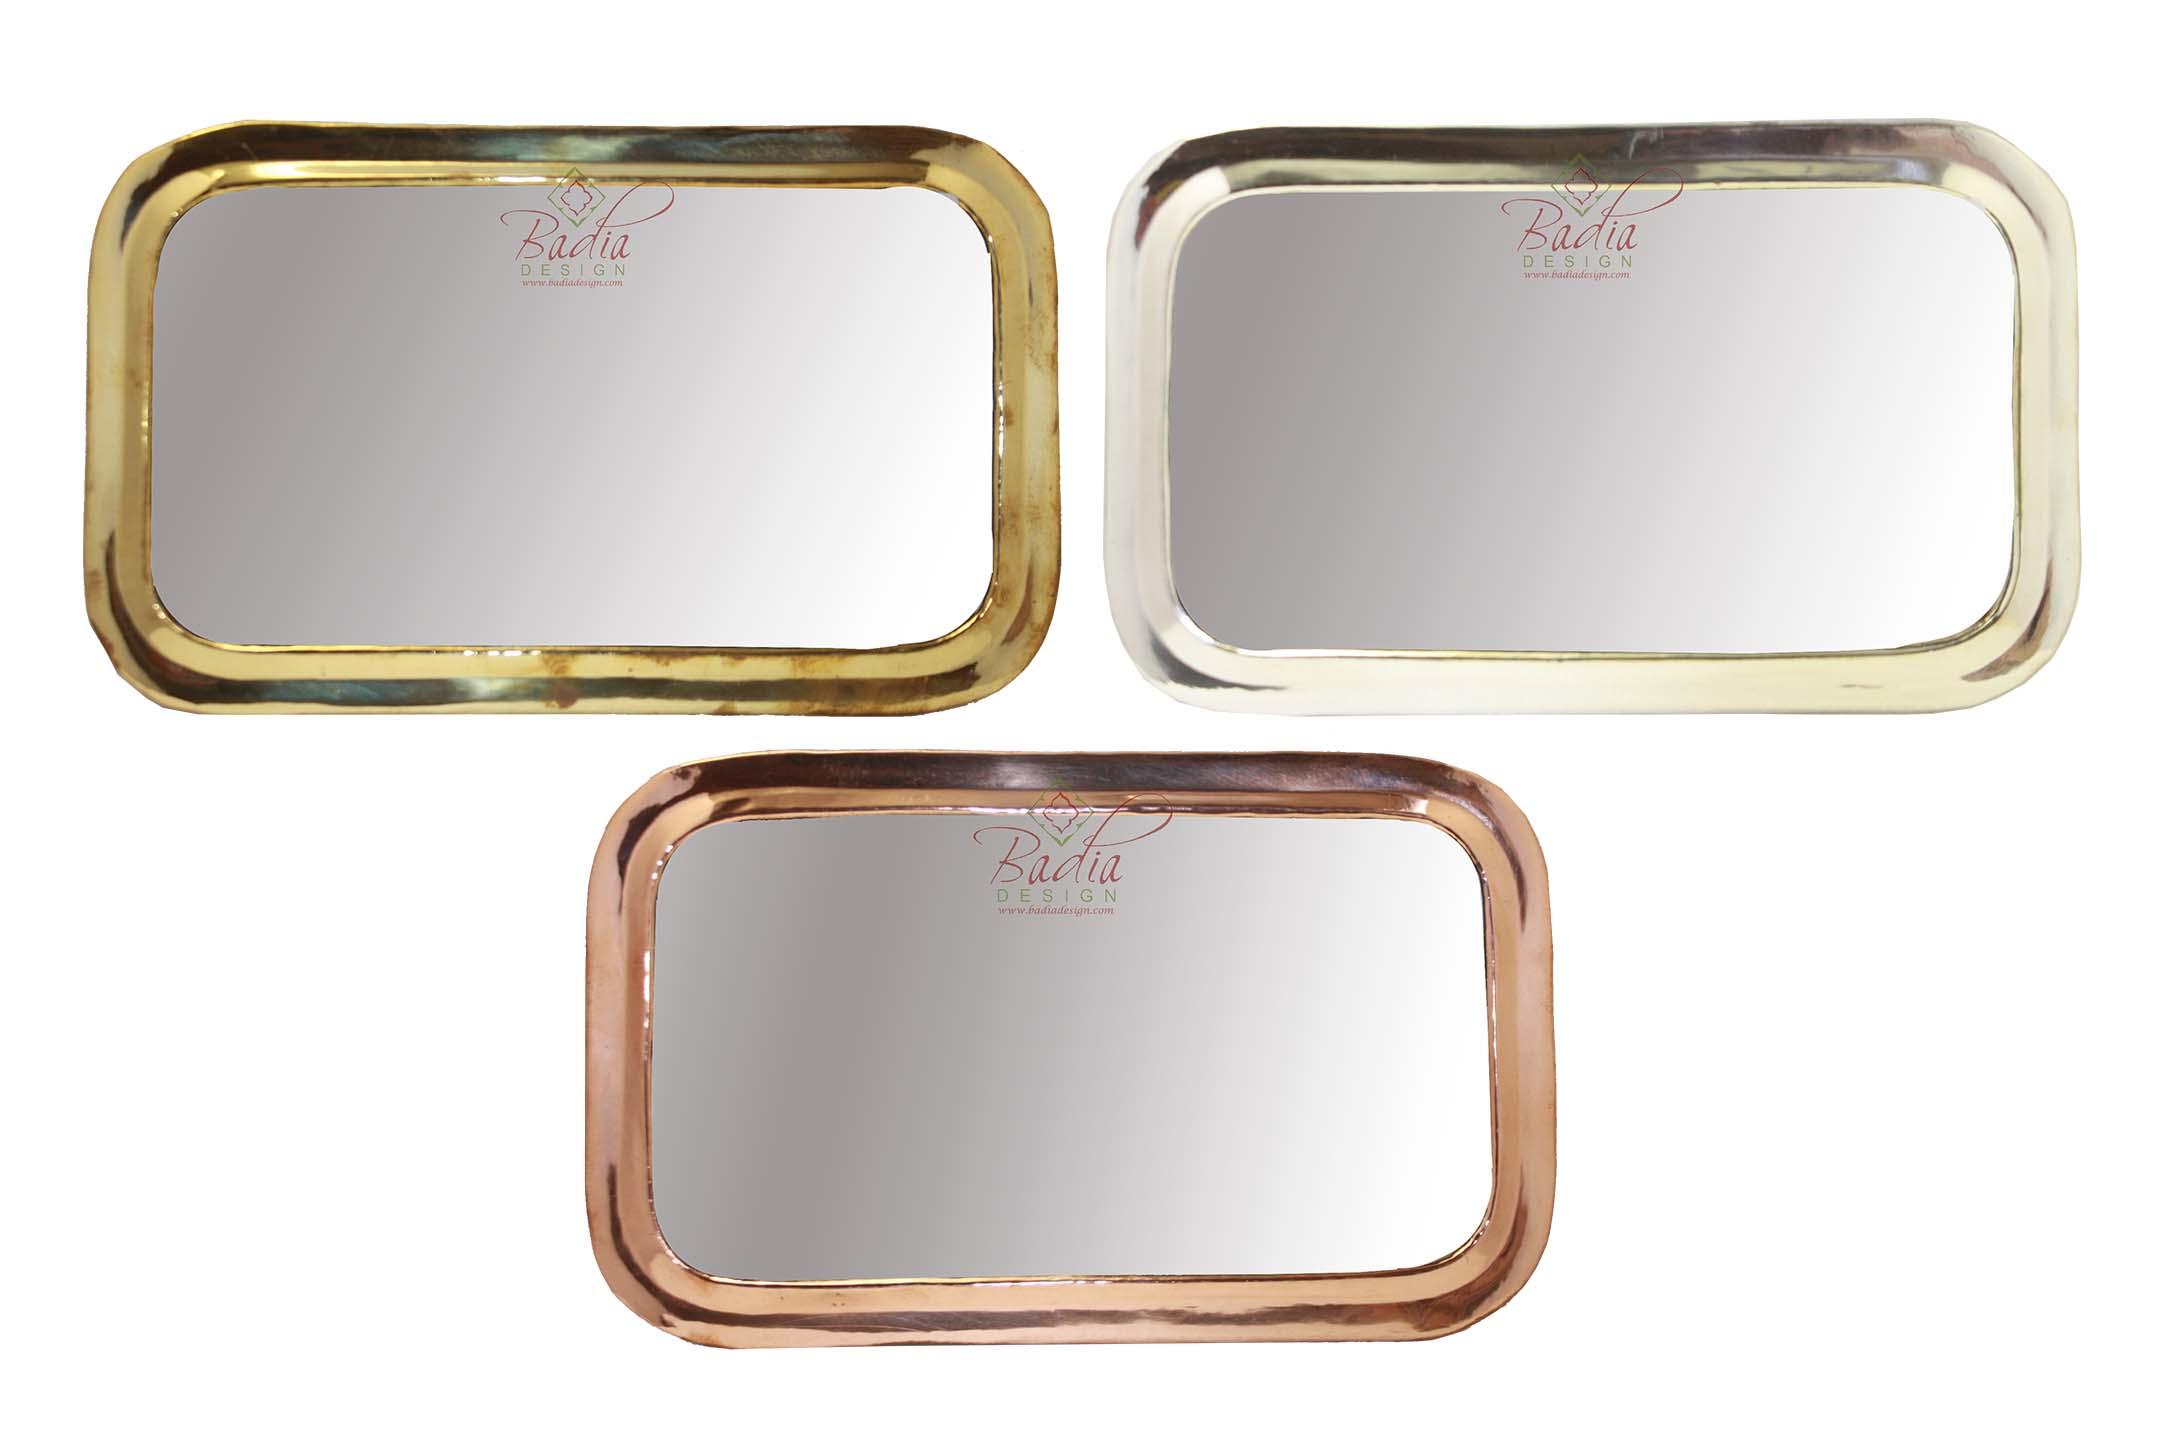 moroccan-rectangular-shaped-mirrors-m-em015.jpg